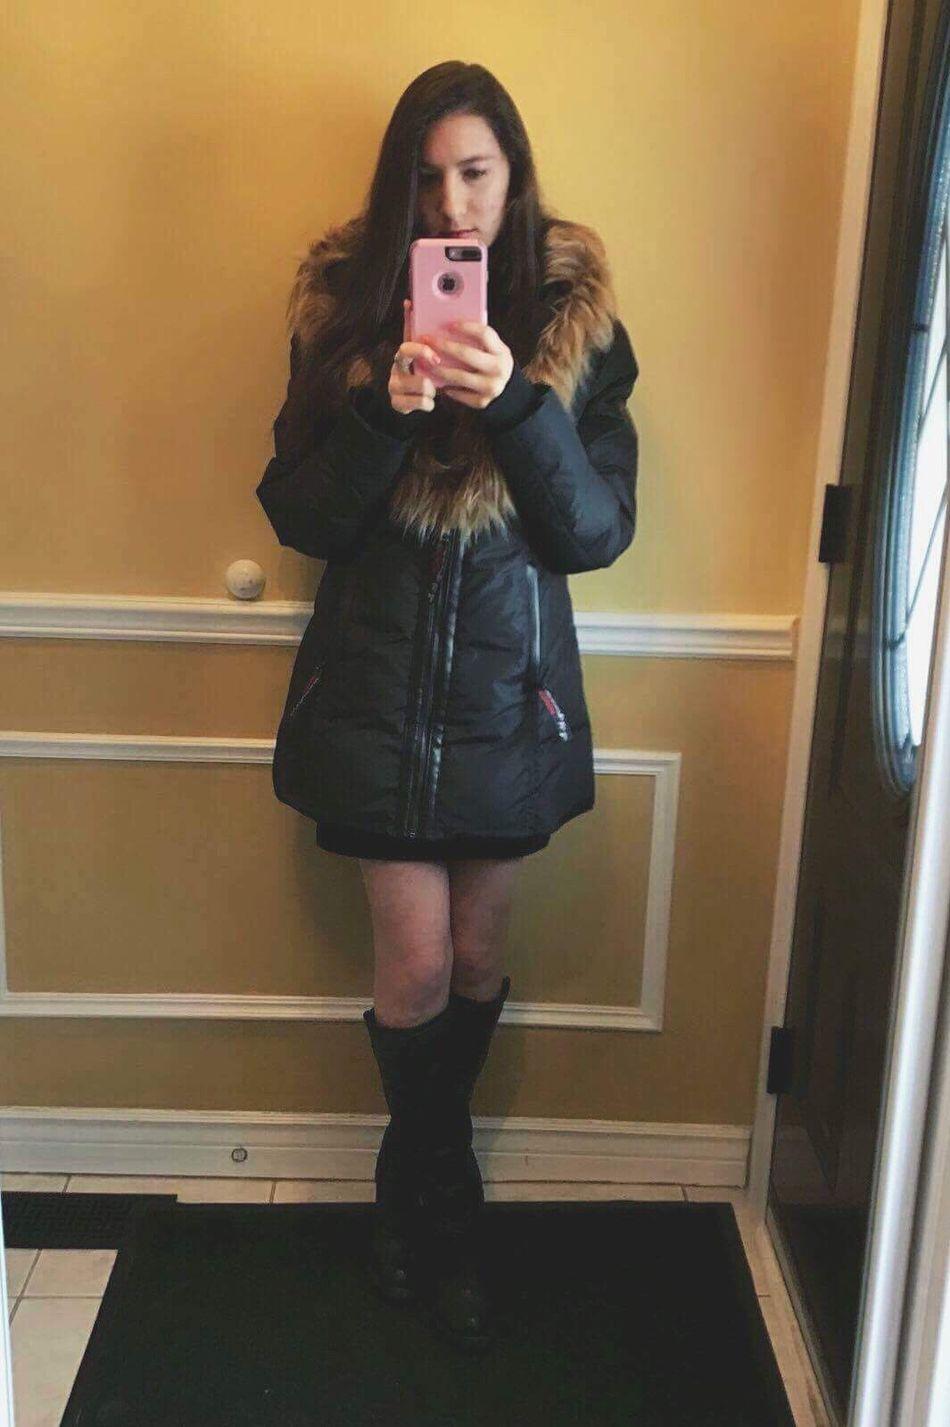 Pretty #love #followMe #smile #ShineBright Indoors  Self Portrait Selfie ♥ Babyshower <3 Canadian Girl Girl FashionWarm Clothing Modern Internet Day Ontario 2017 IPhone Iphone7plusphoto